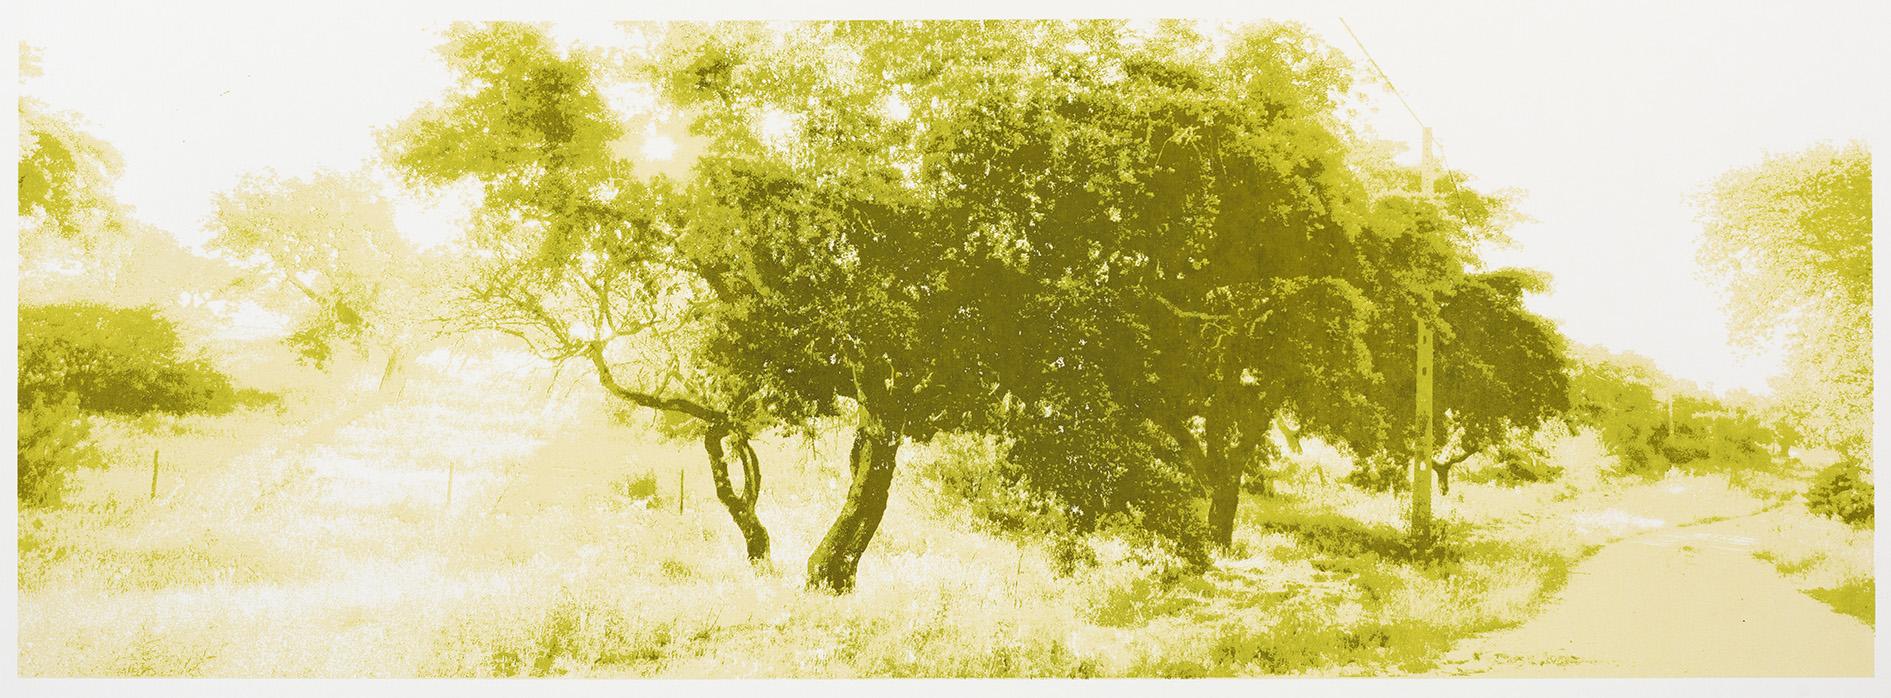 """Change of Seasons III (summer), 35 x 100 cm., silkscreenprint (2015)"